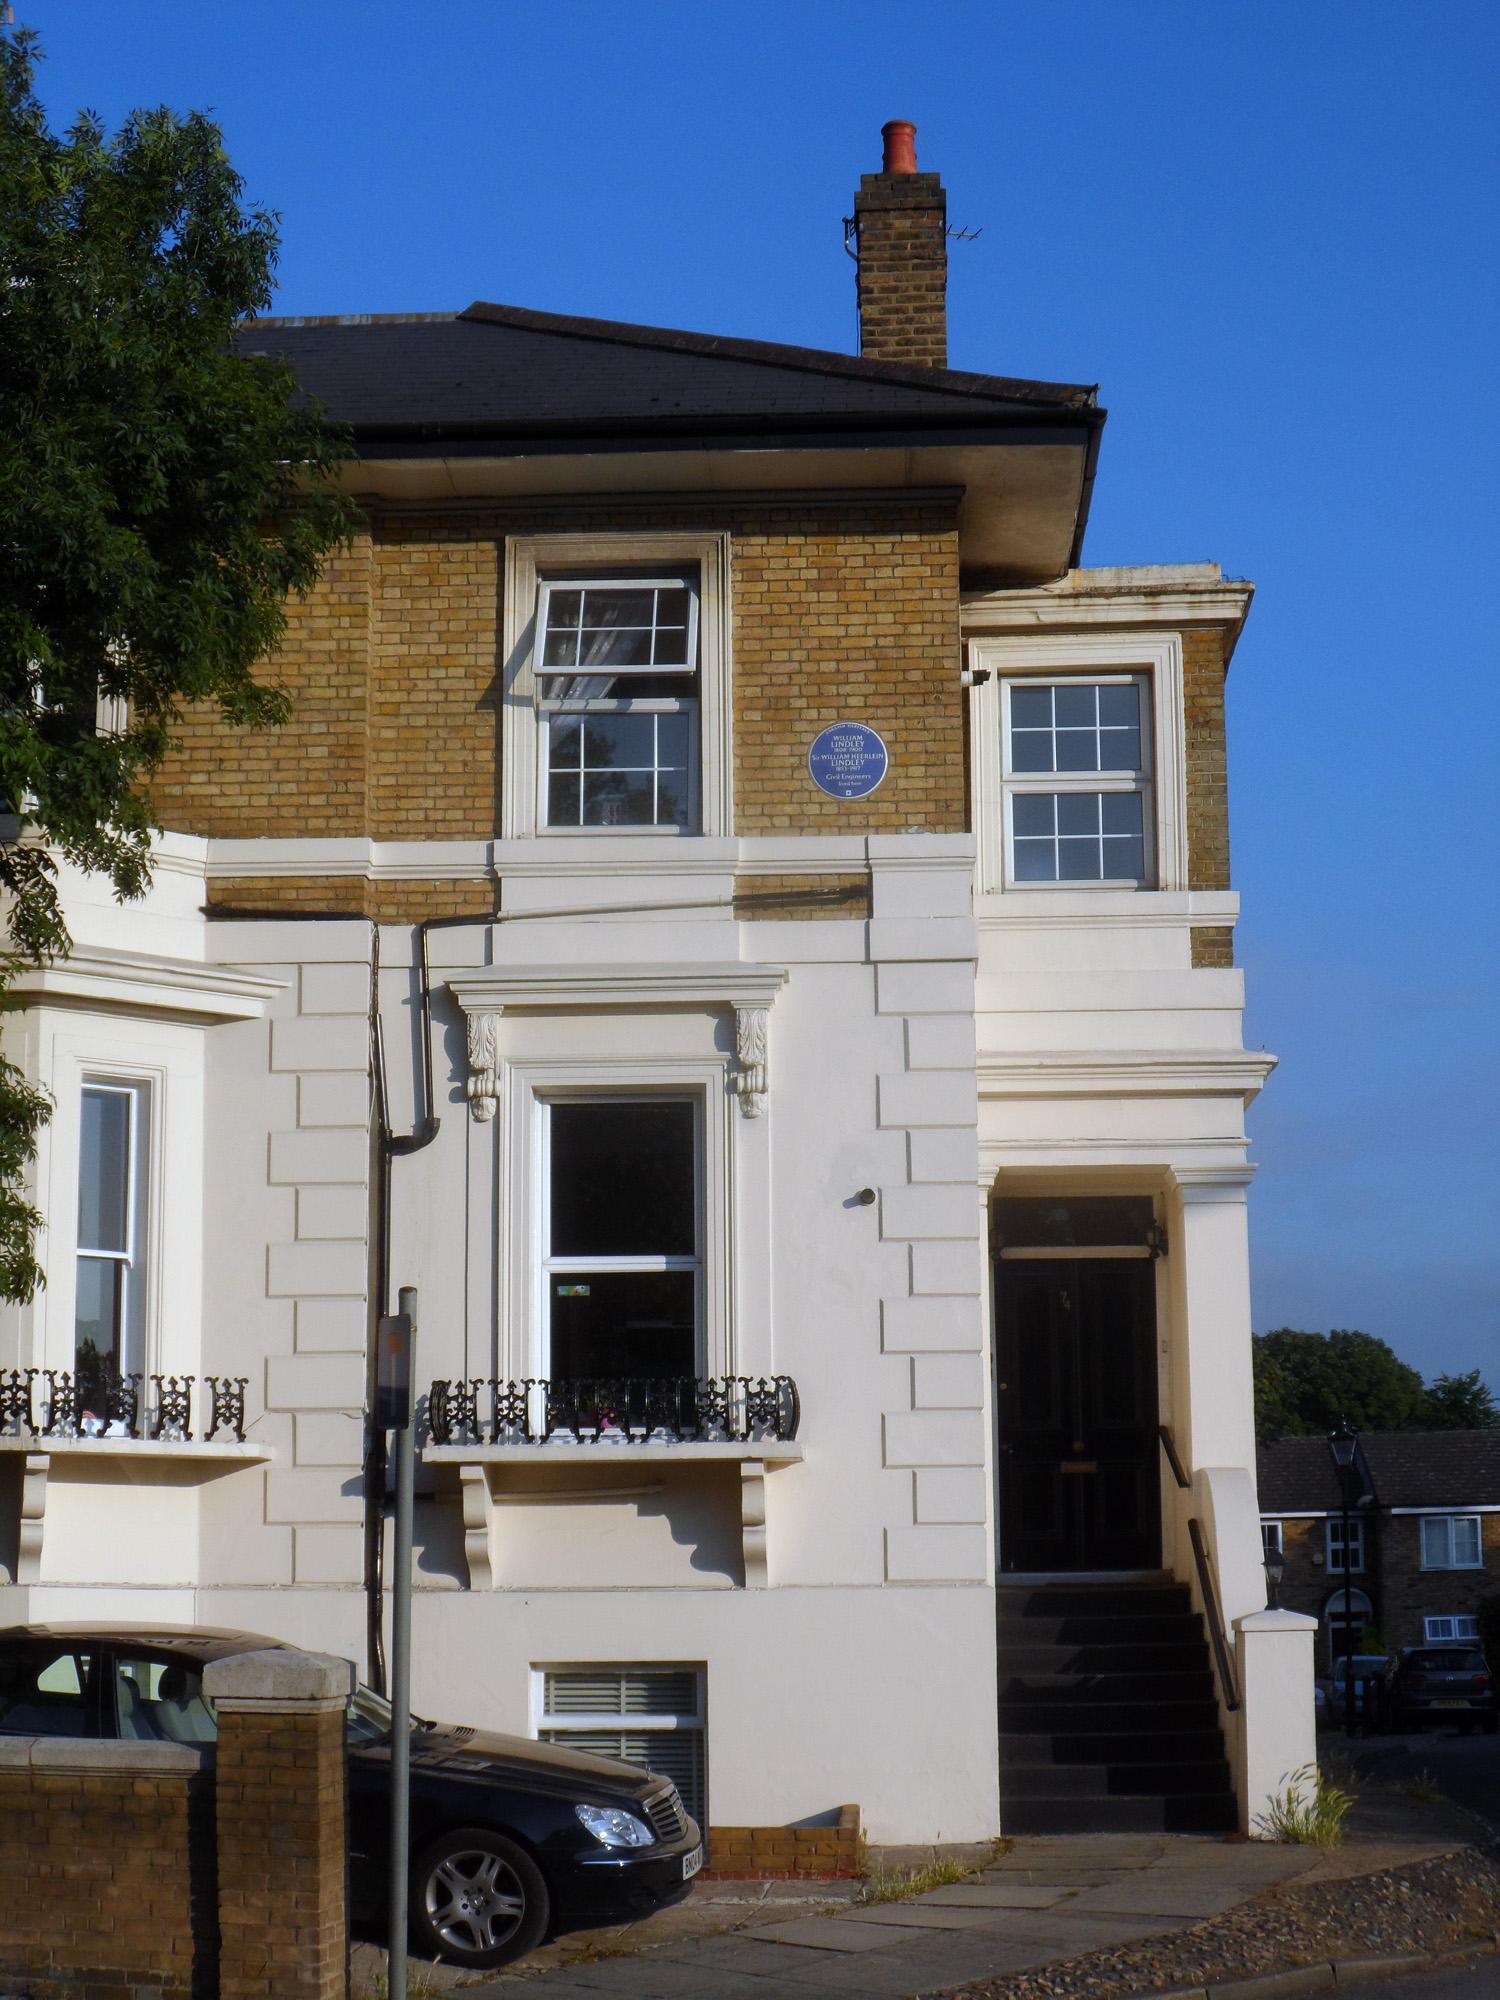 Lindleys' House